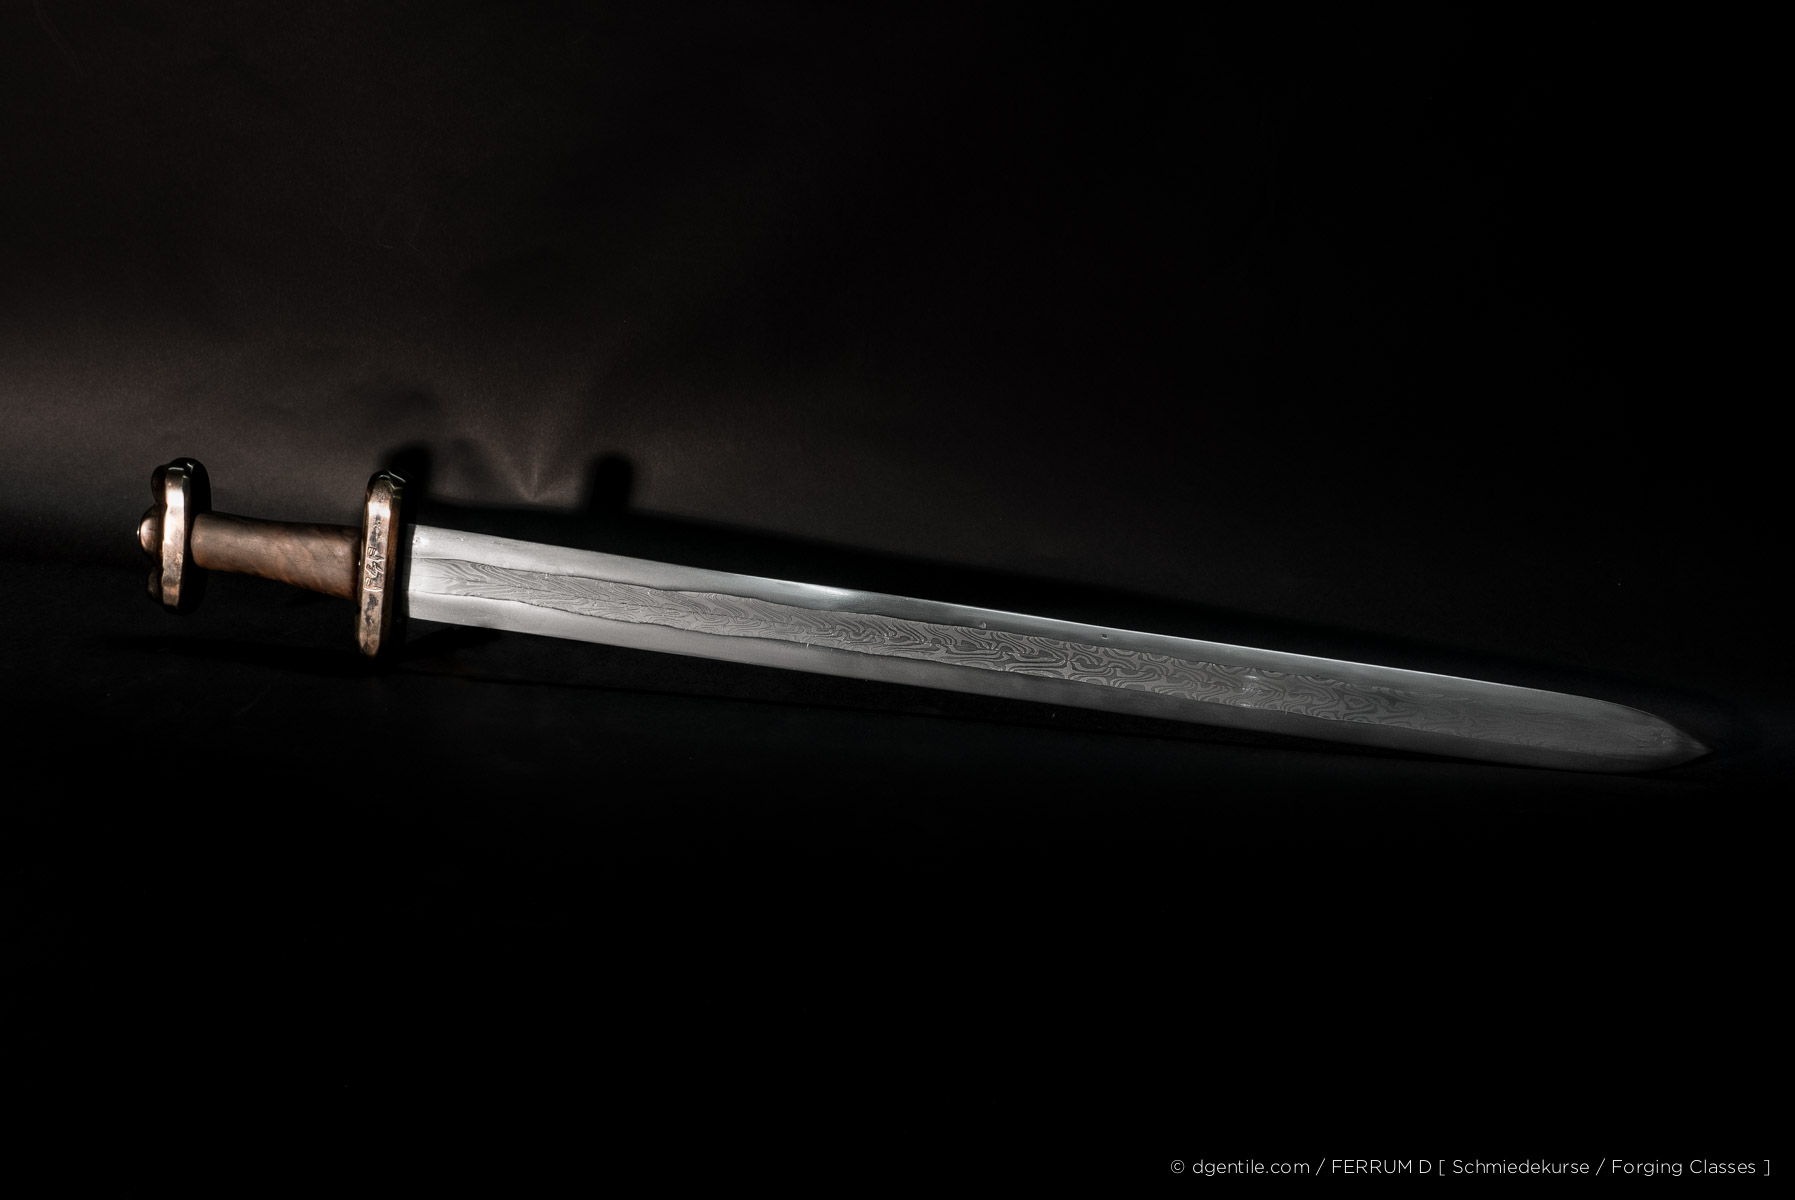 8 Tage Kurs - Vikinger Schwert, mehrbahniger Verbundschweissstahl (Damaszenerstahl)   8 Day Class - Viking Sword, composite patternwelded steel